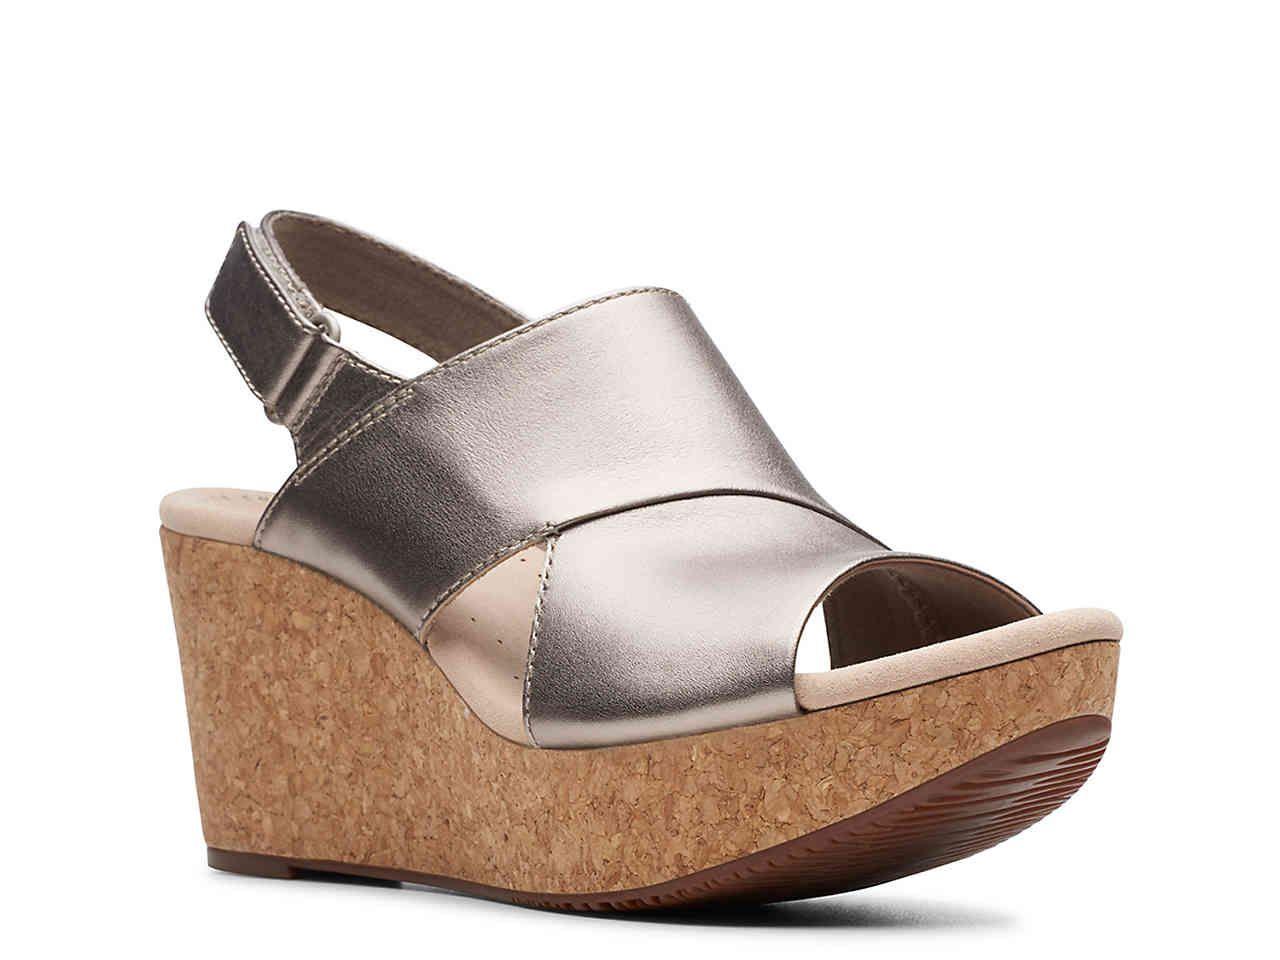 NIB Born Women/'s Fremont Sandal In Brown